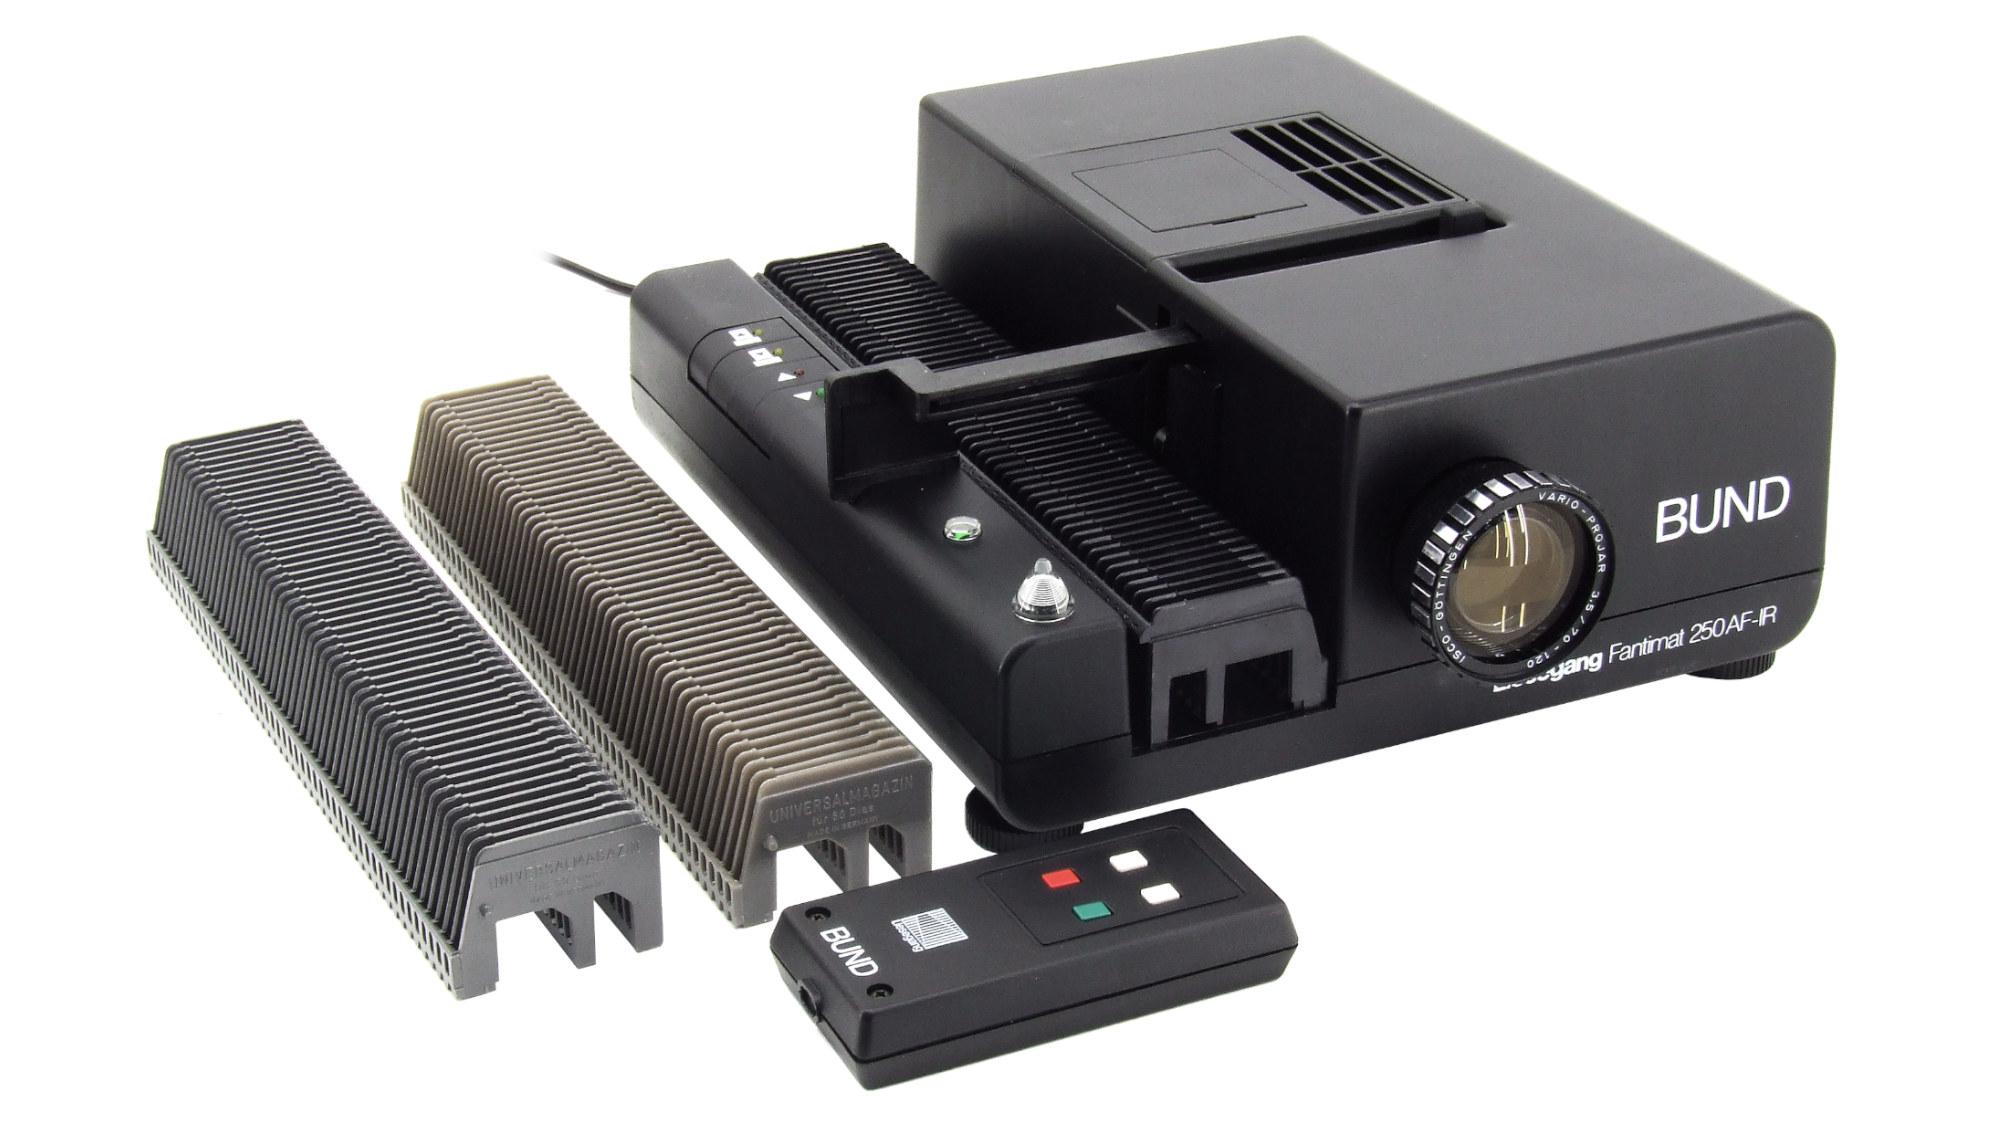 Dia-Projektor leihen